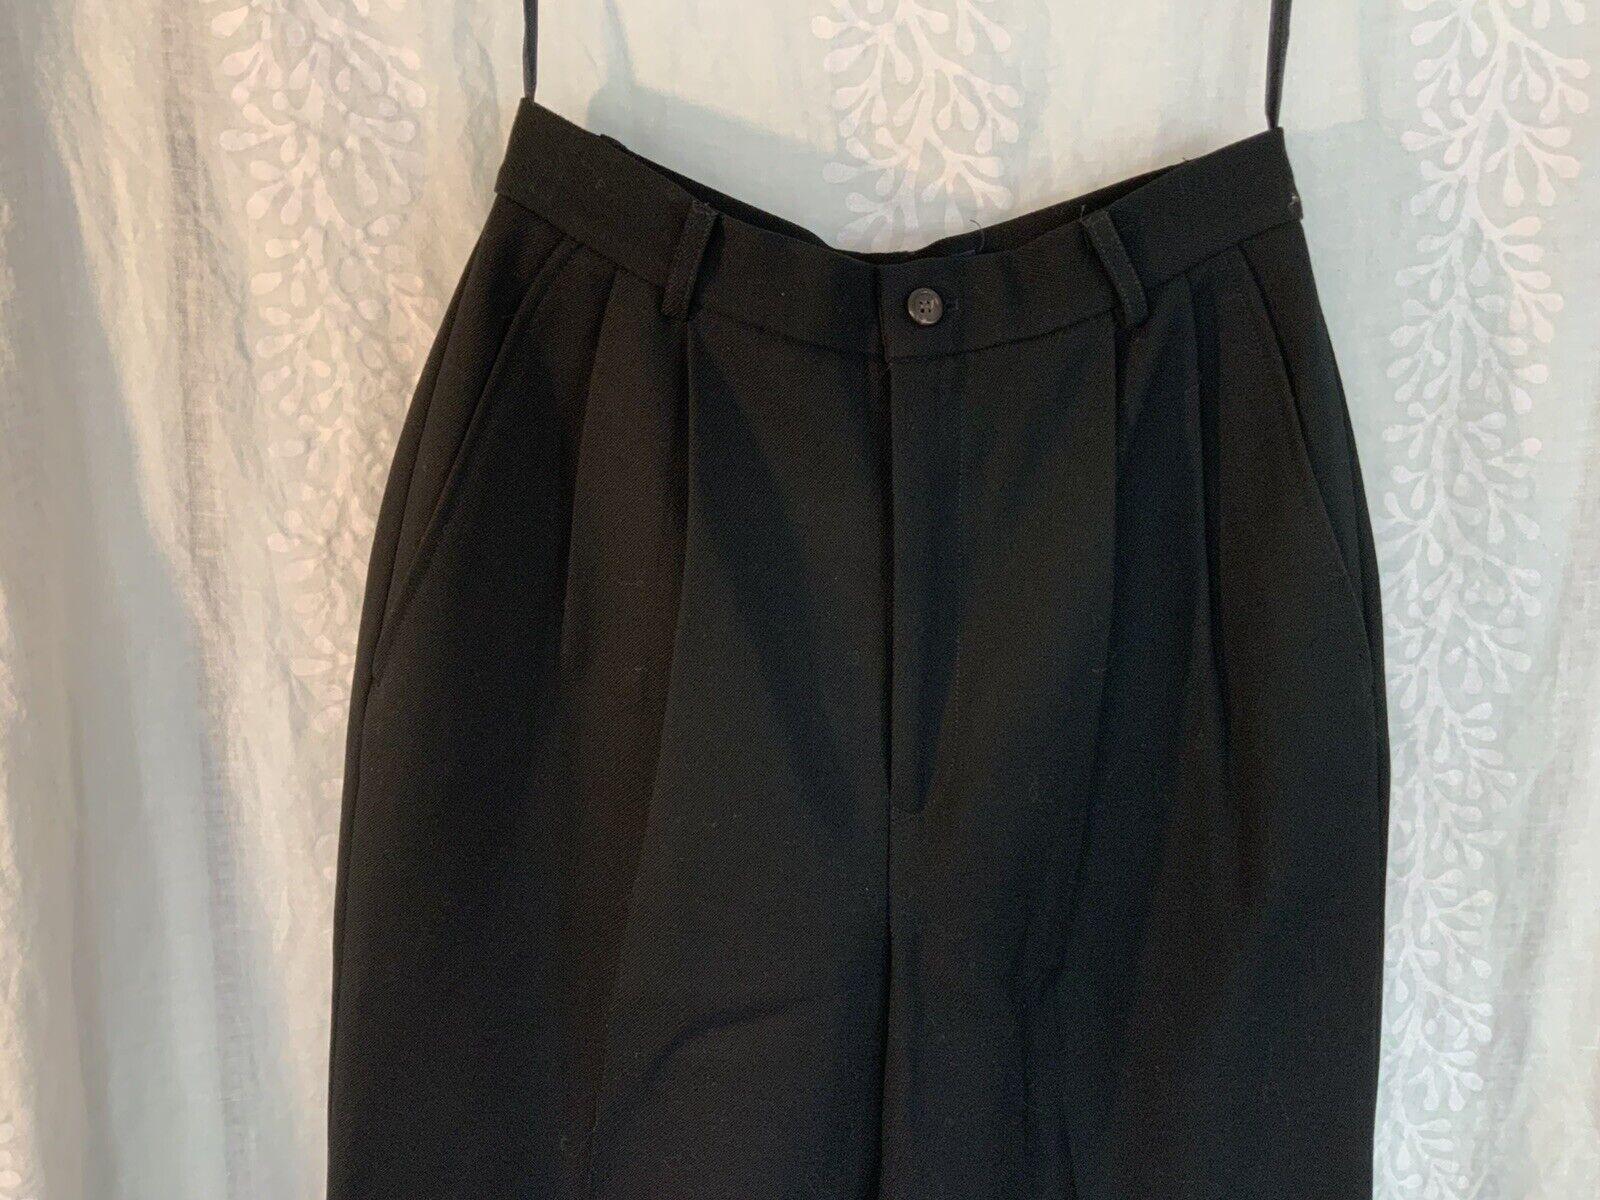 Vintage Ralph Lauren pants black 80s 90s - image 4